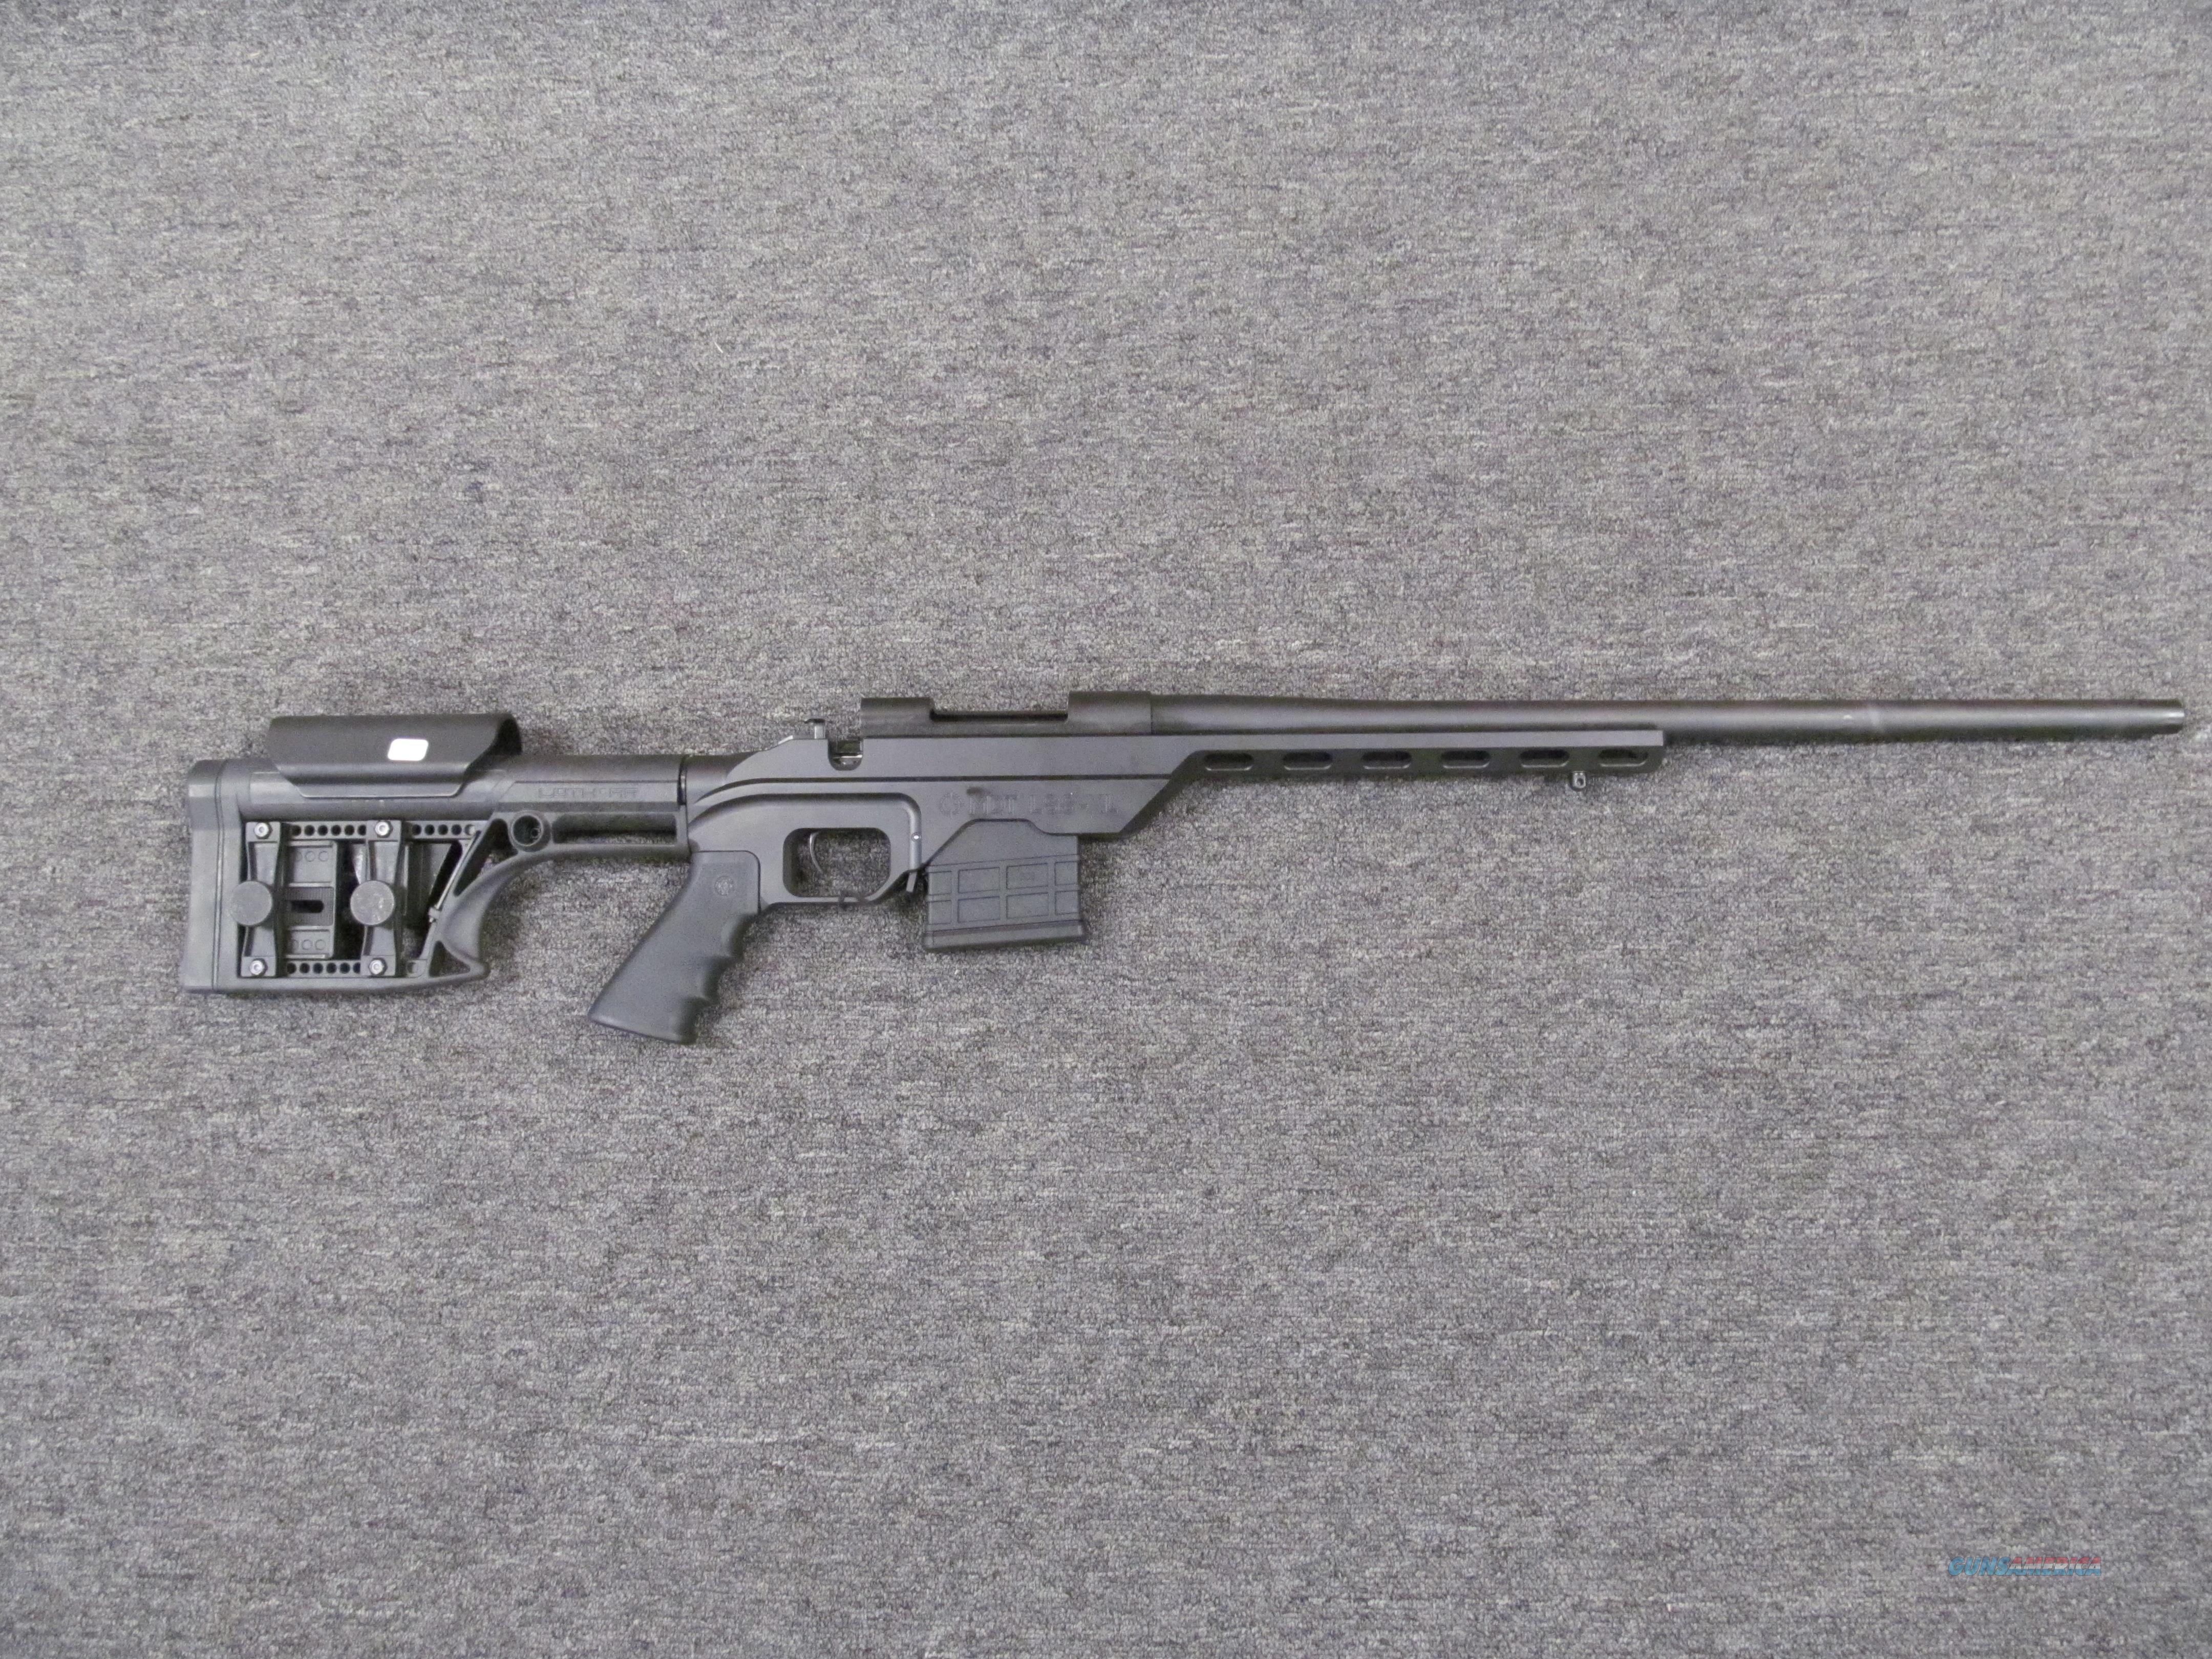 Weatherby Vanguard (MDT LSS-XL) .308  Guns > Rifles > Weatherby Rifles > Tactical